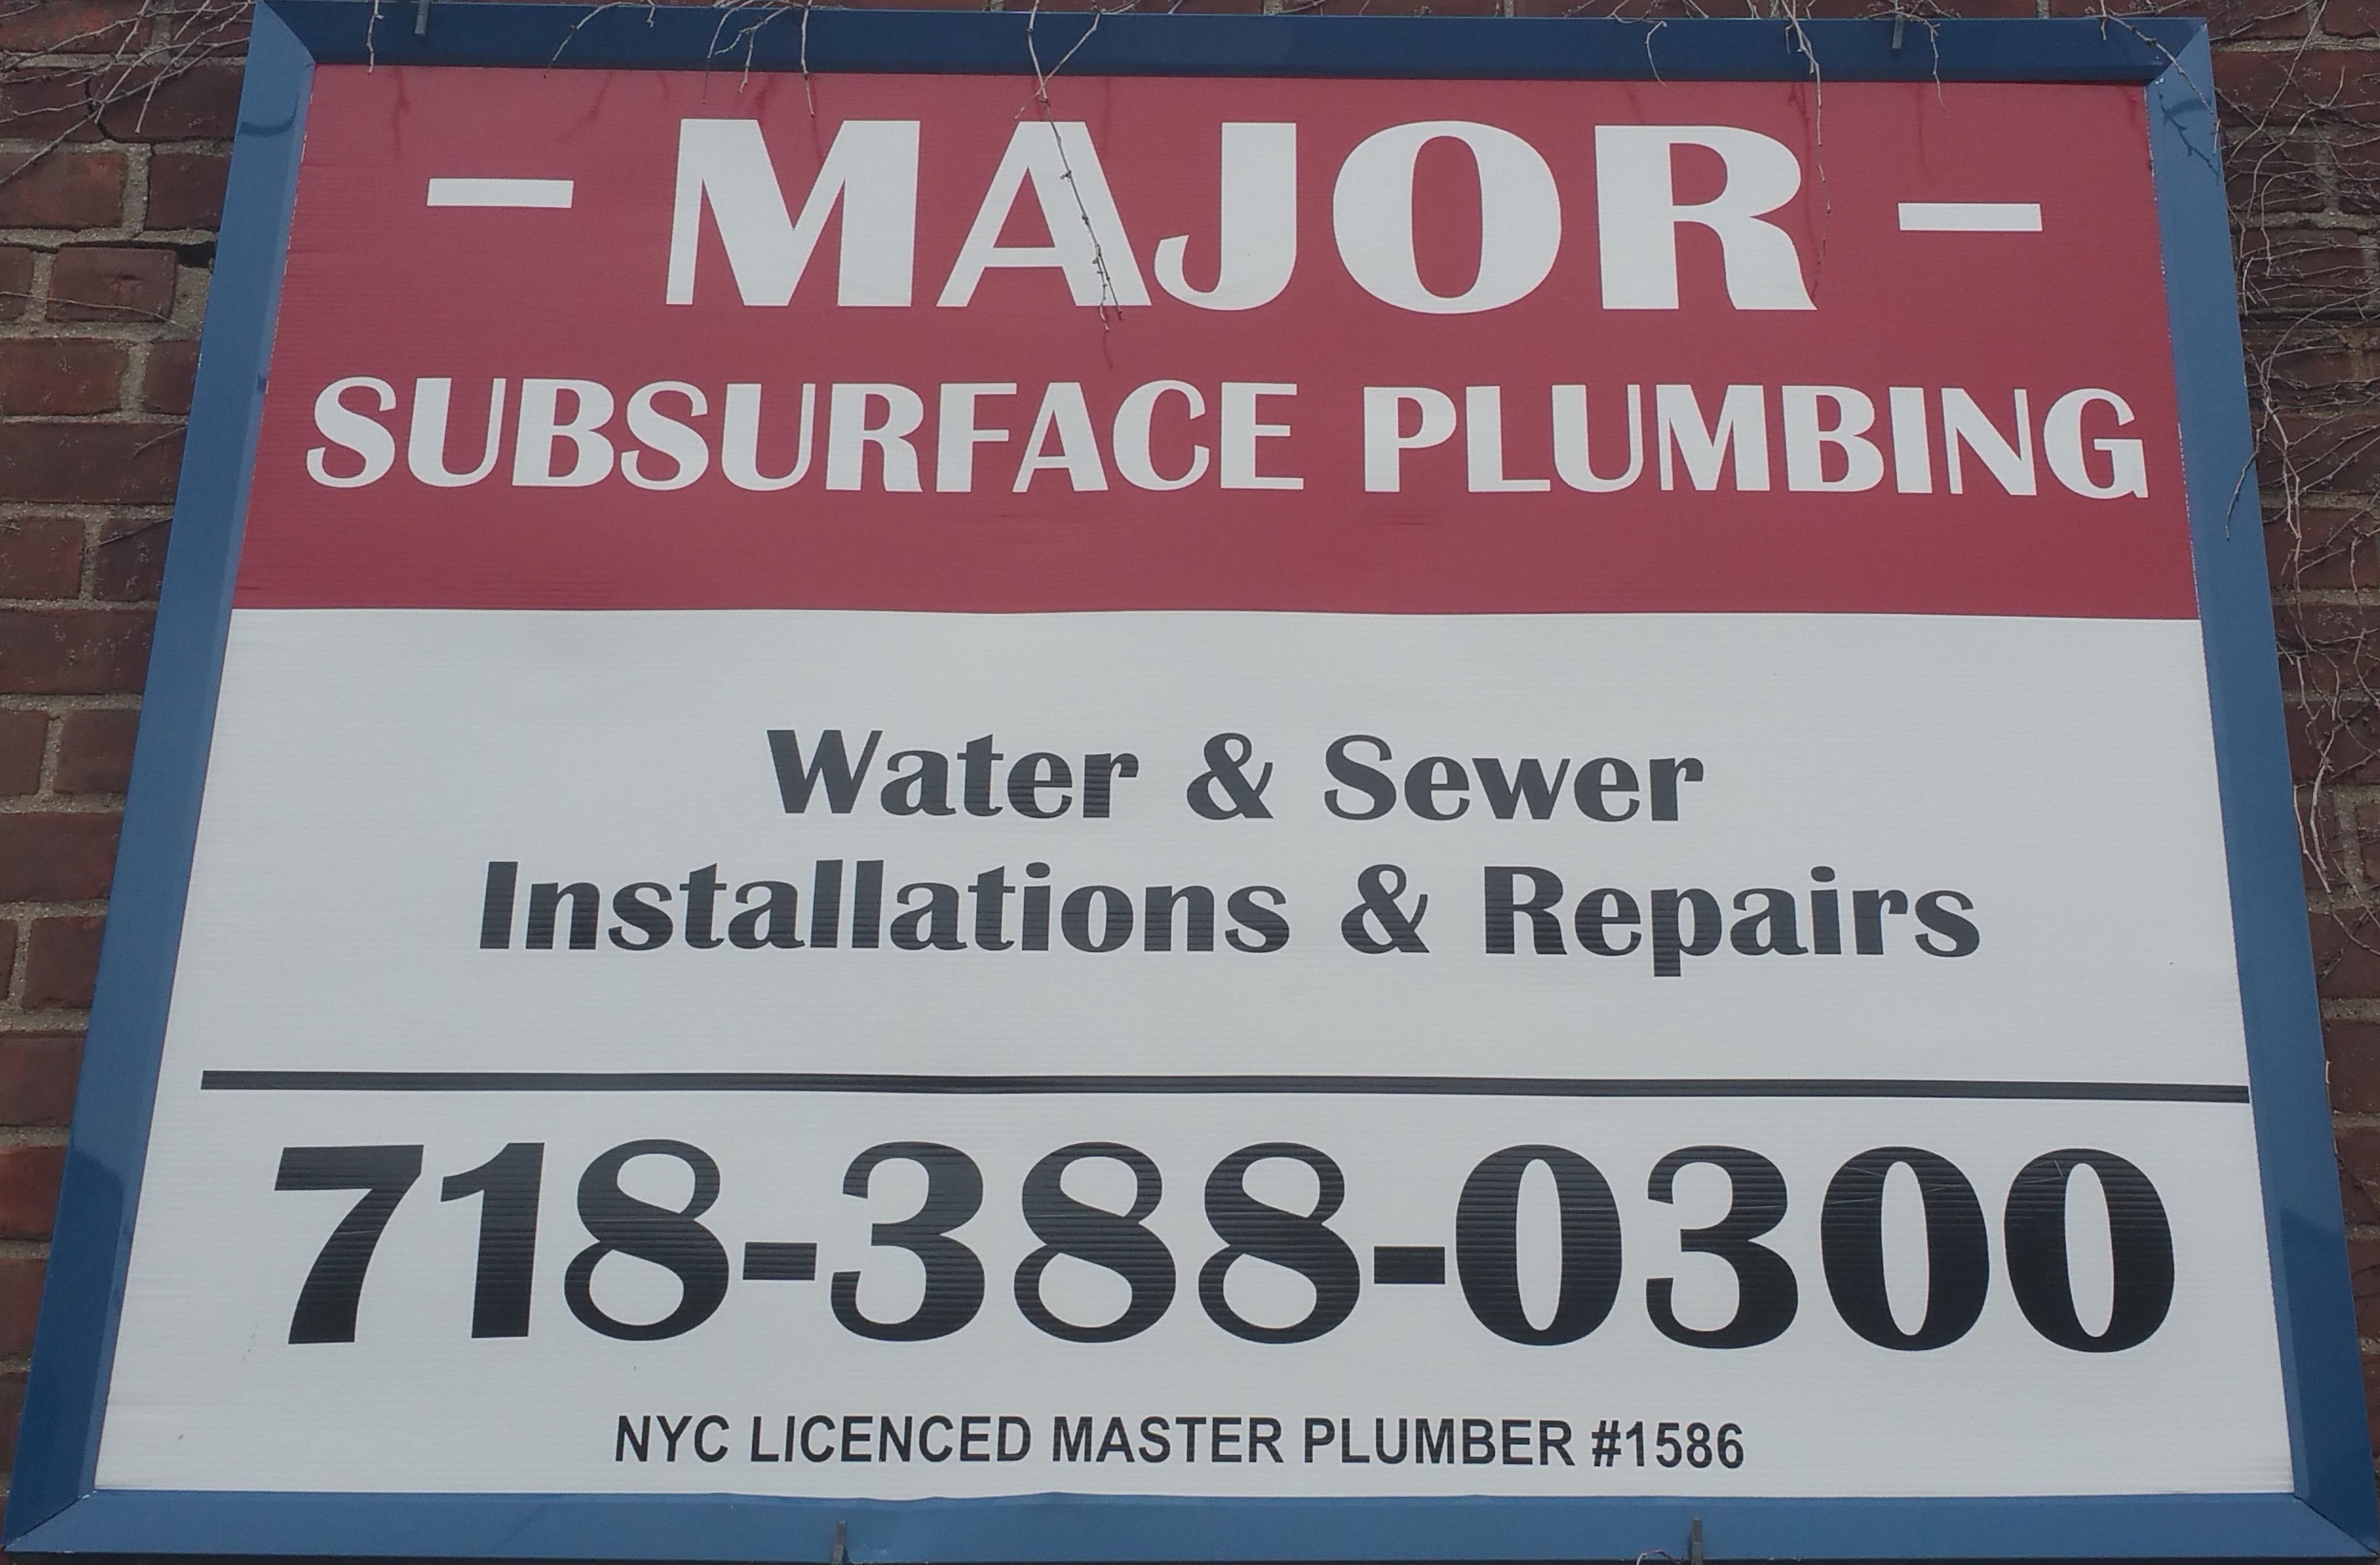 Major Subsurface Plumbing Corp.